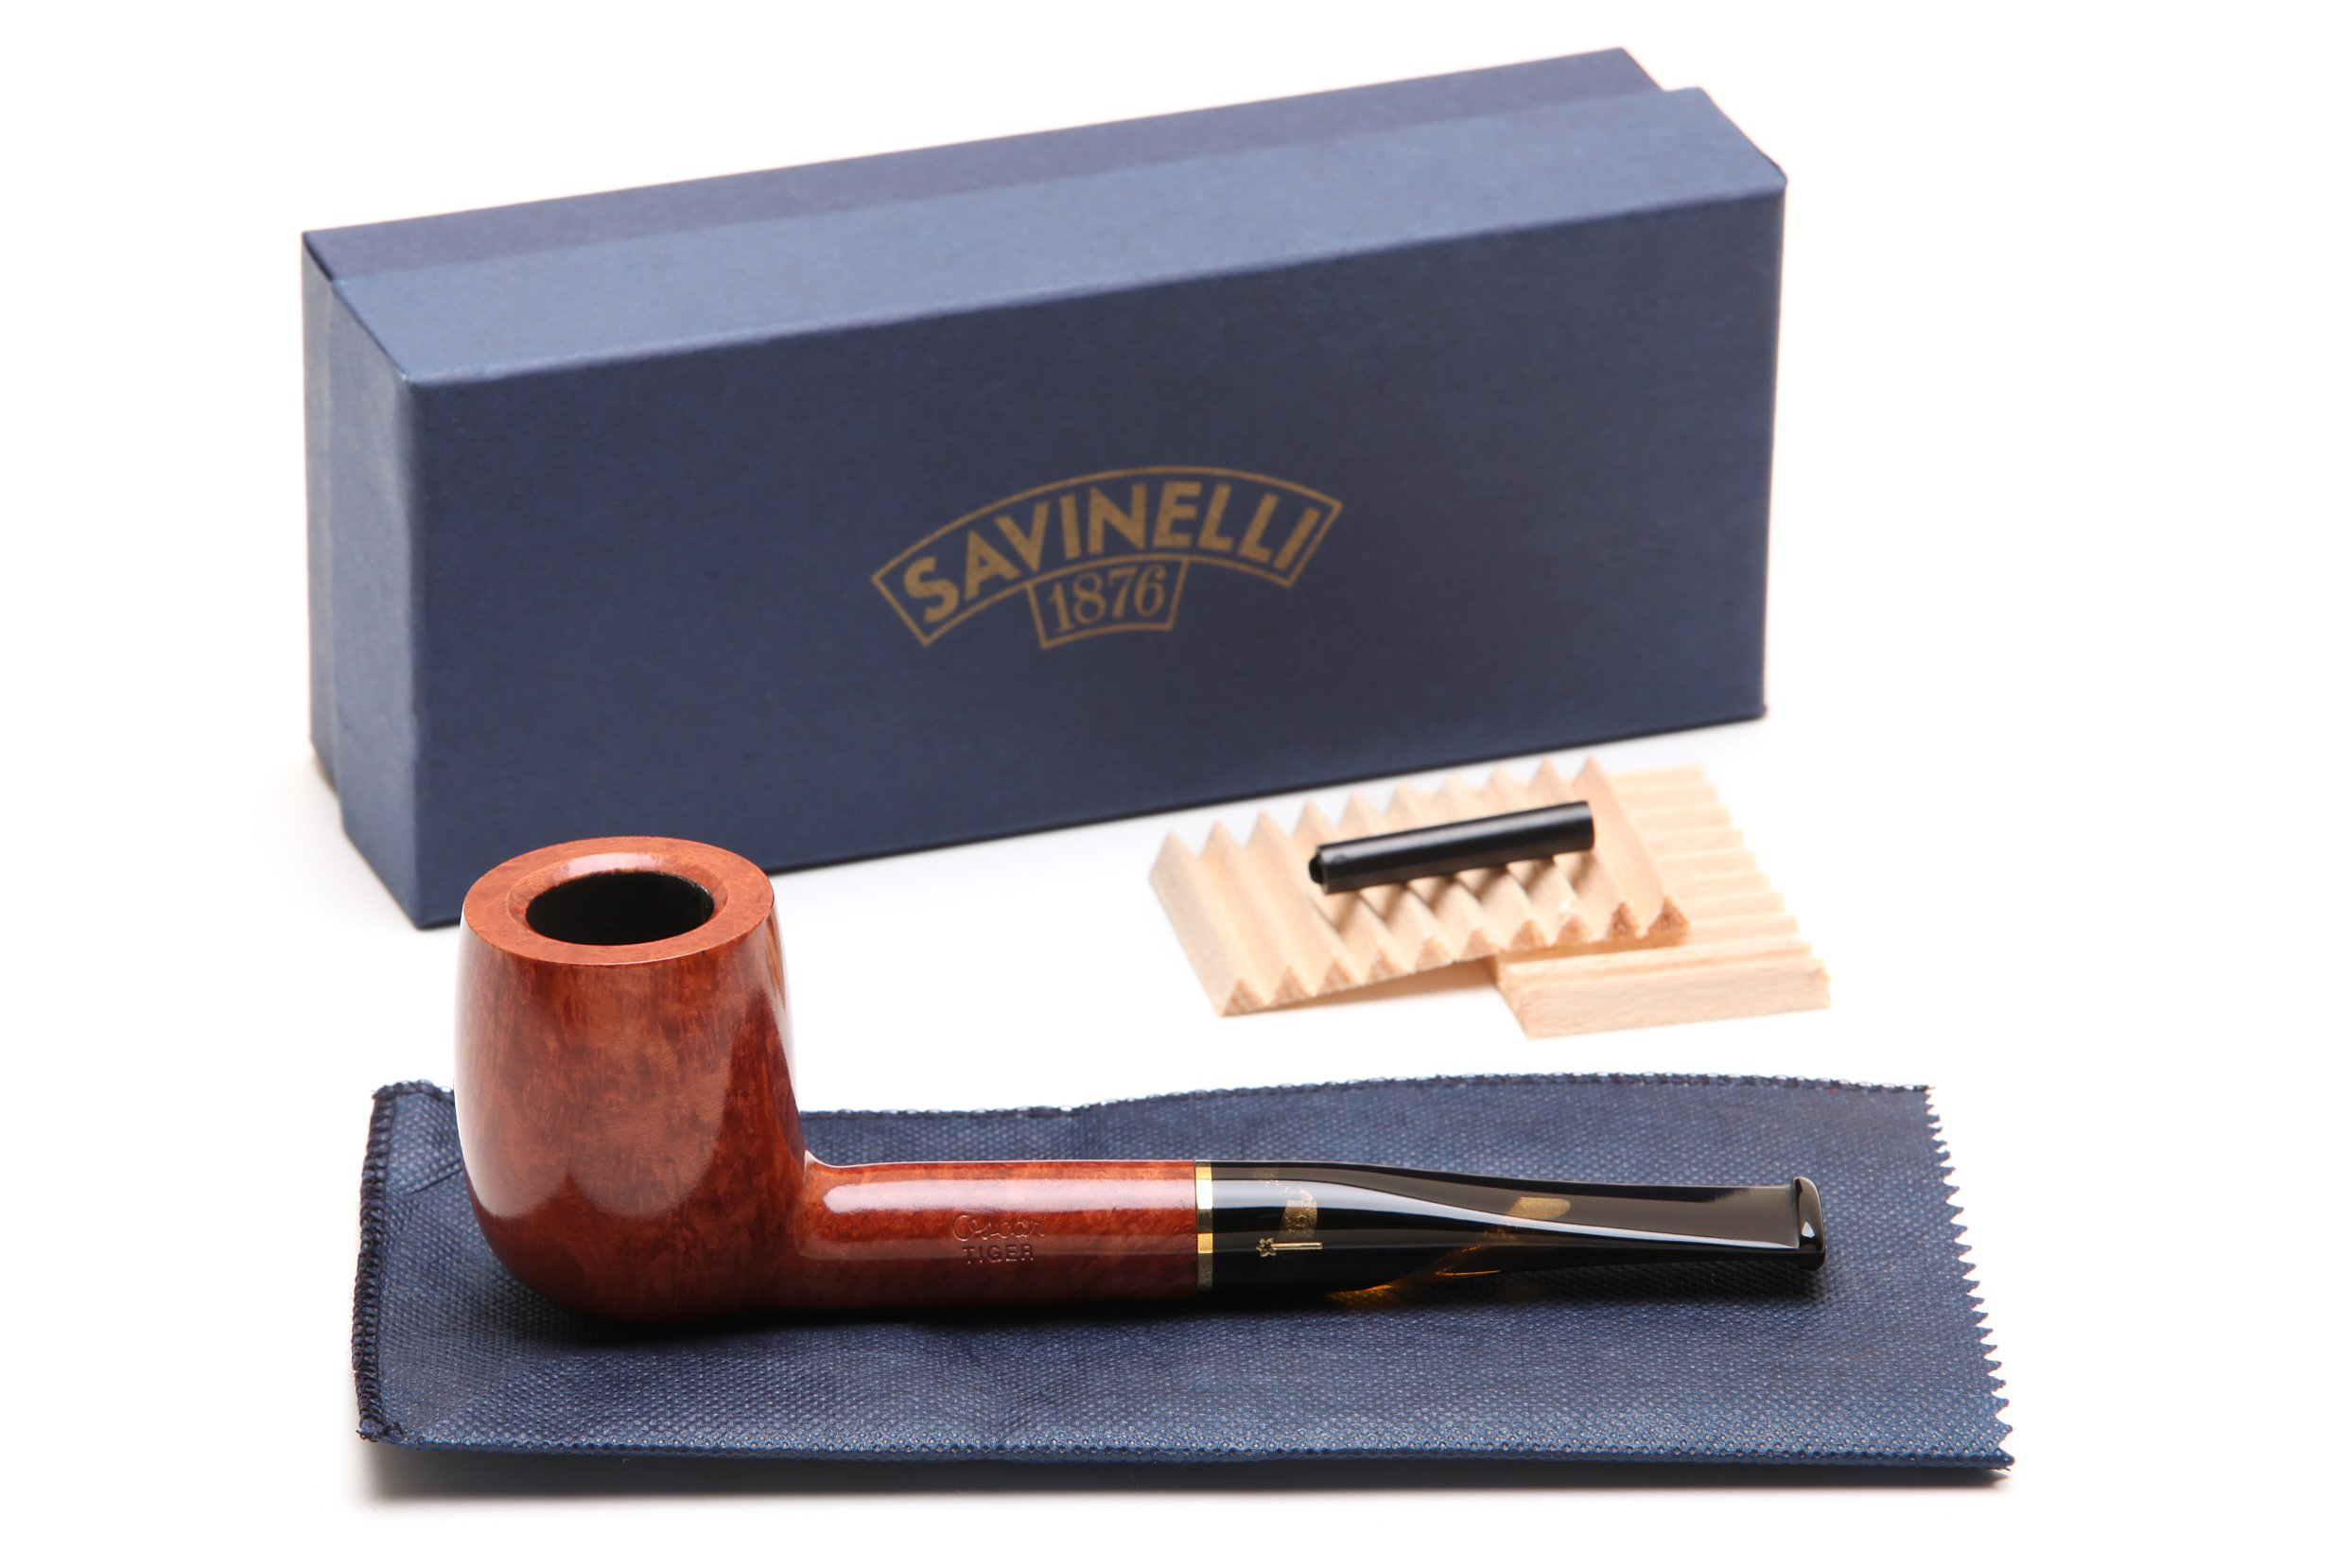 Savinelli Oscar Tiger Smooth Briar Pipe KS 111 Tobacco Pipe